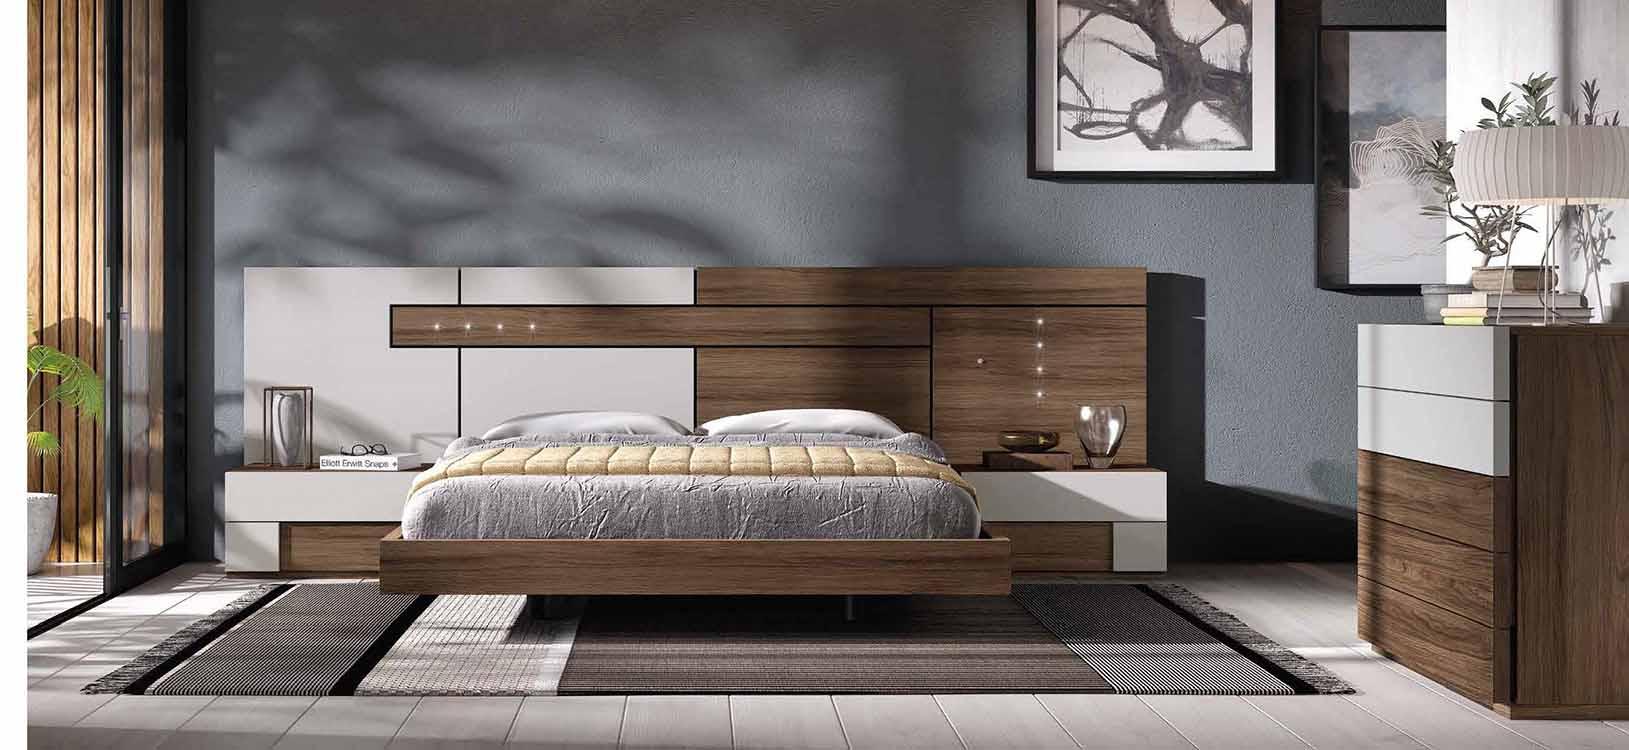 Comprar camas grandes for Muebles para dormitorios modernos